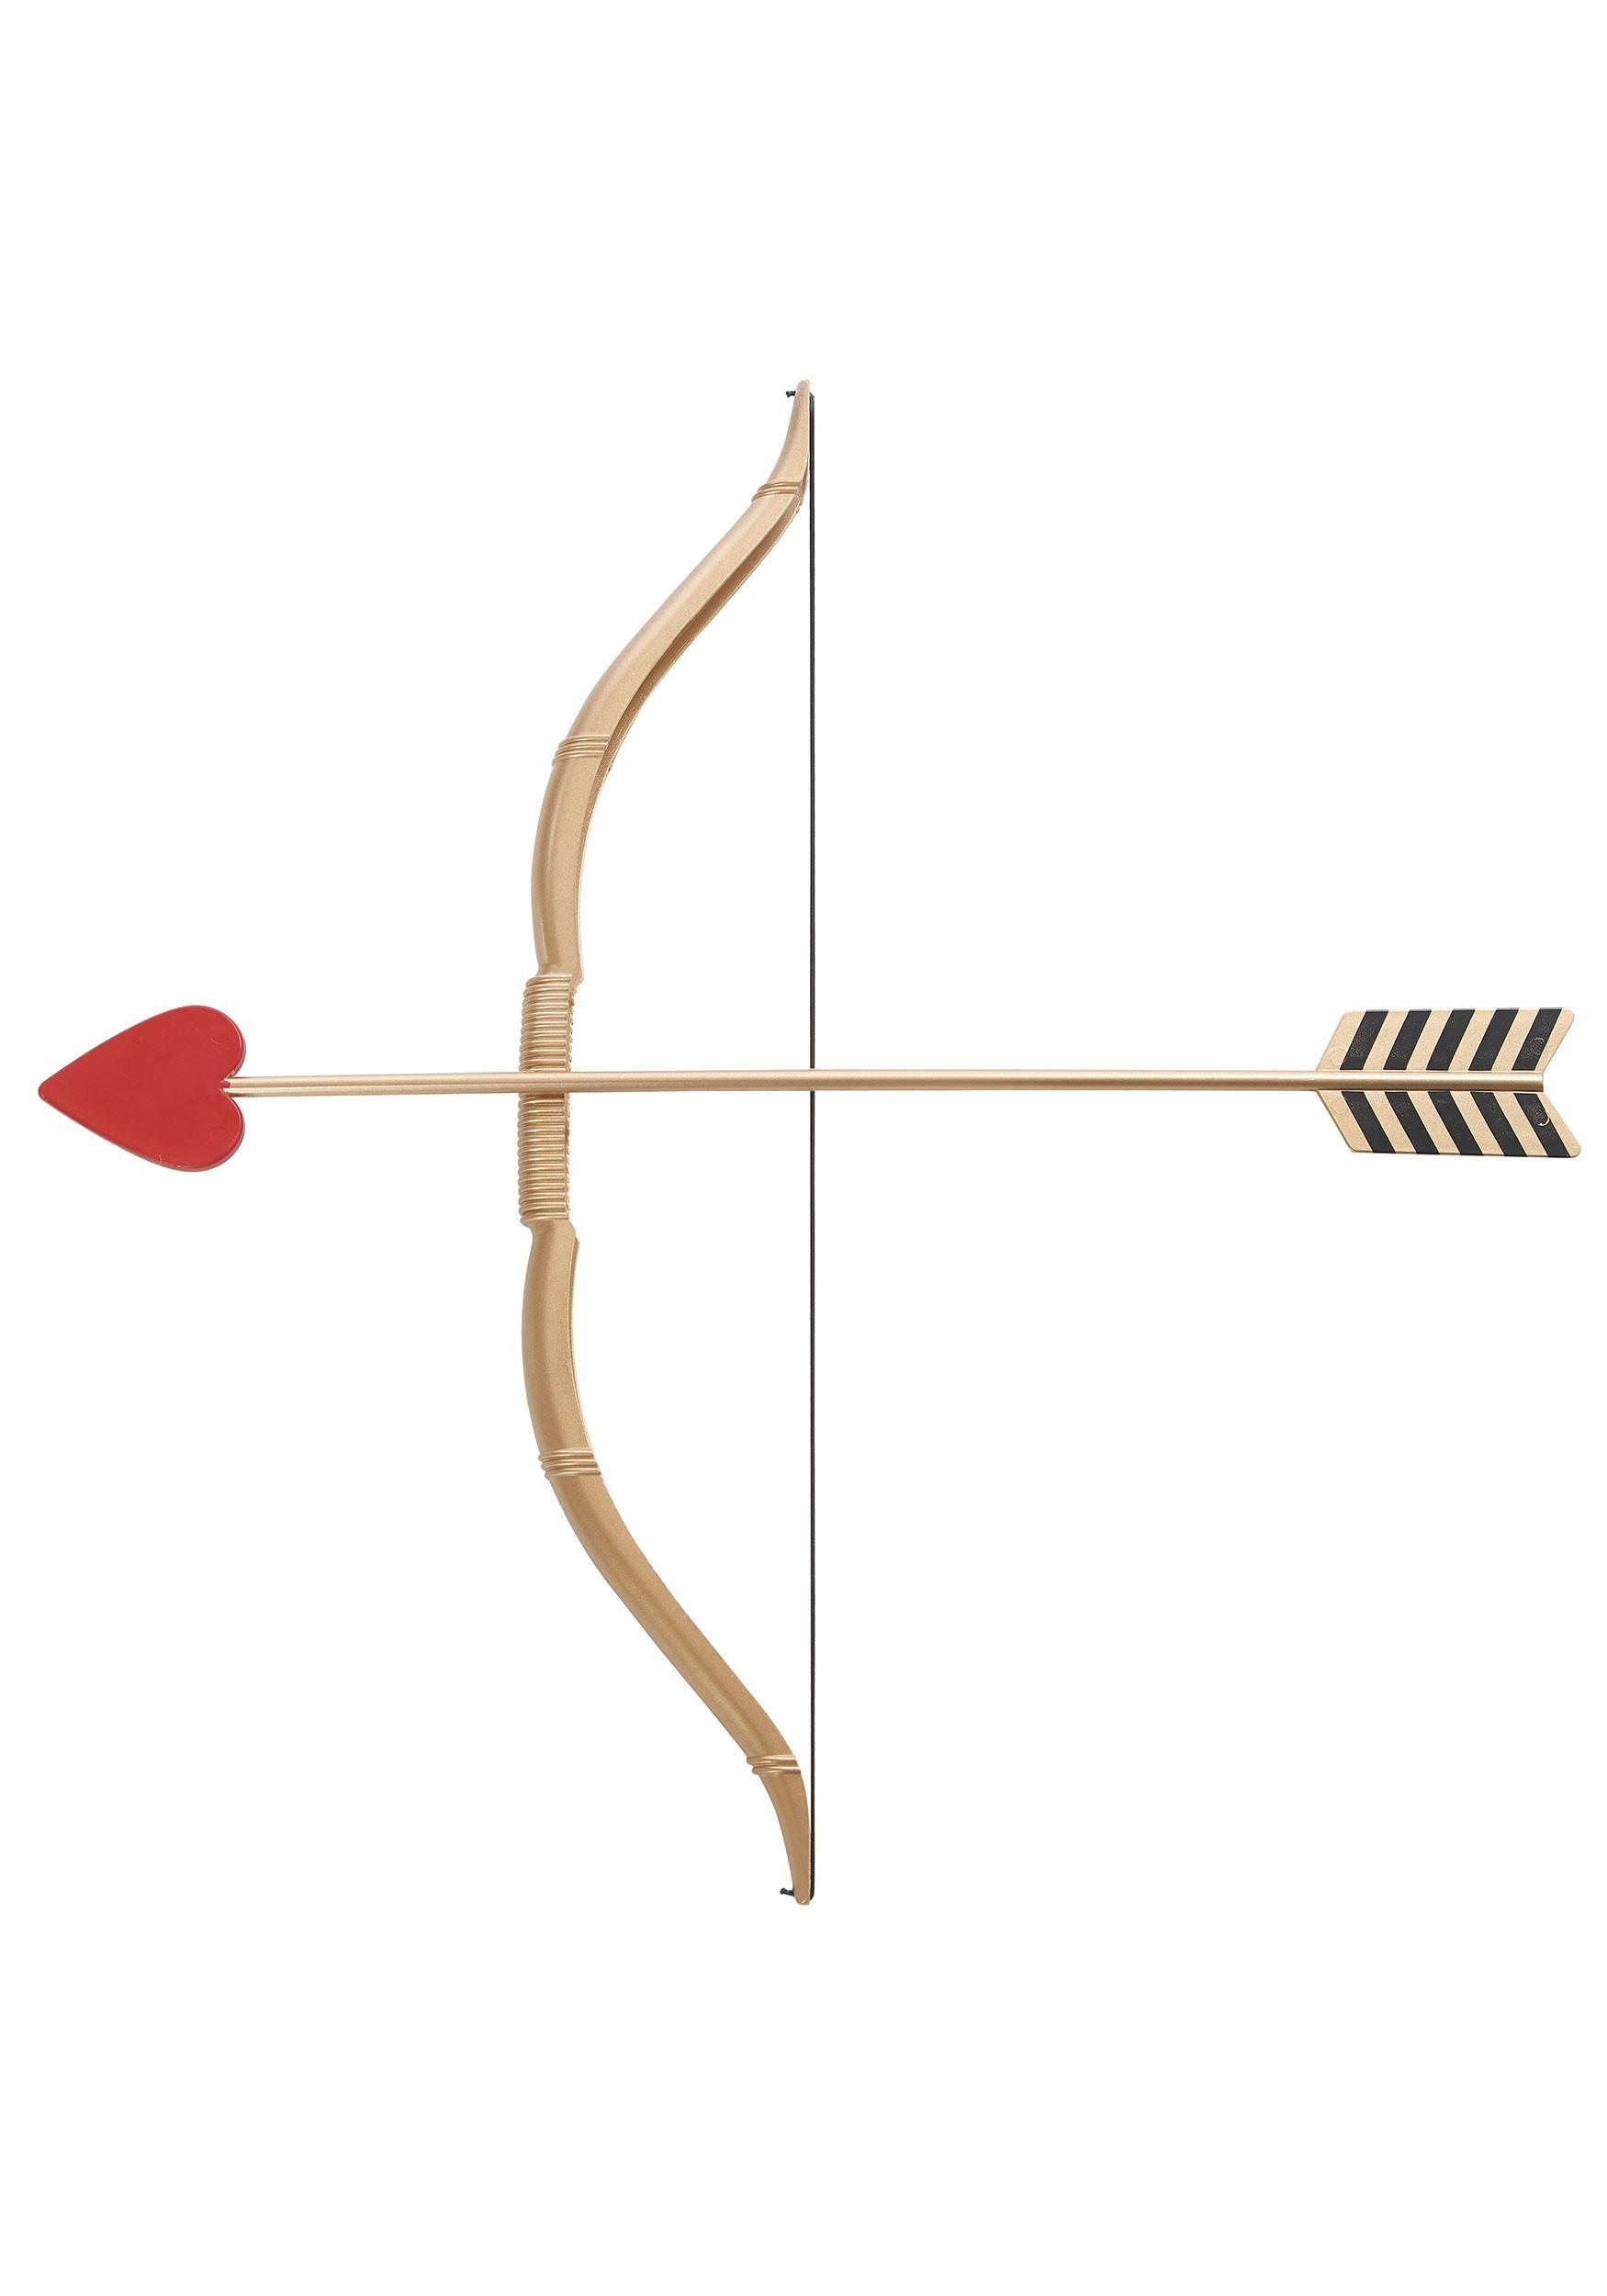 Cupids mini bow and arrow set